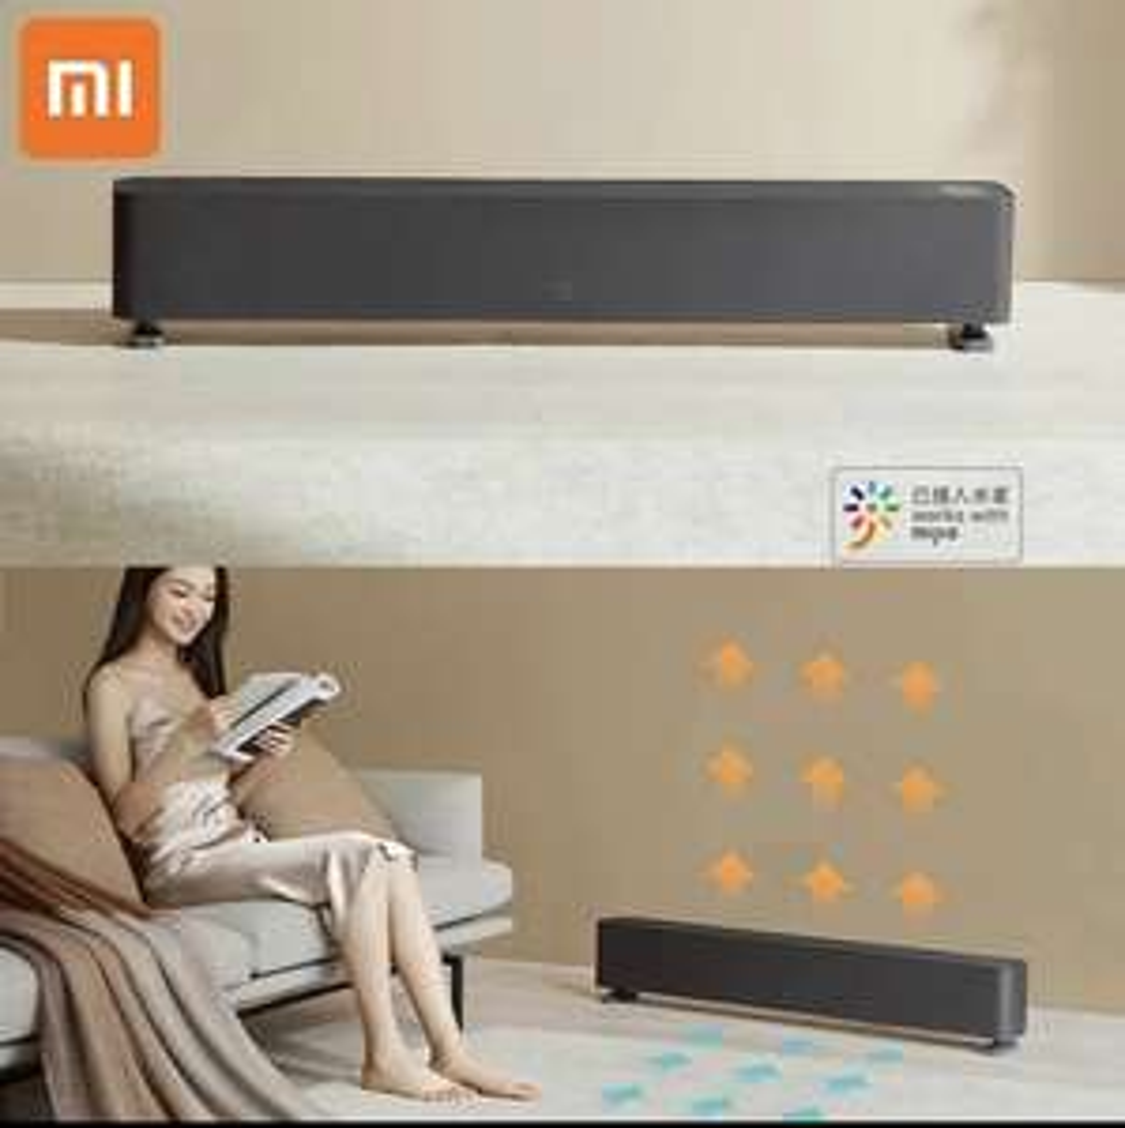 Xiaomi Mijia Baseboard Heater 1S